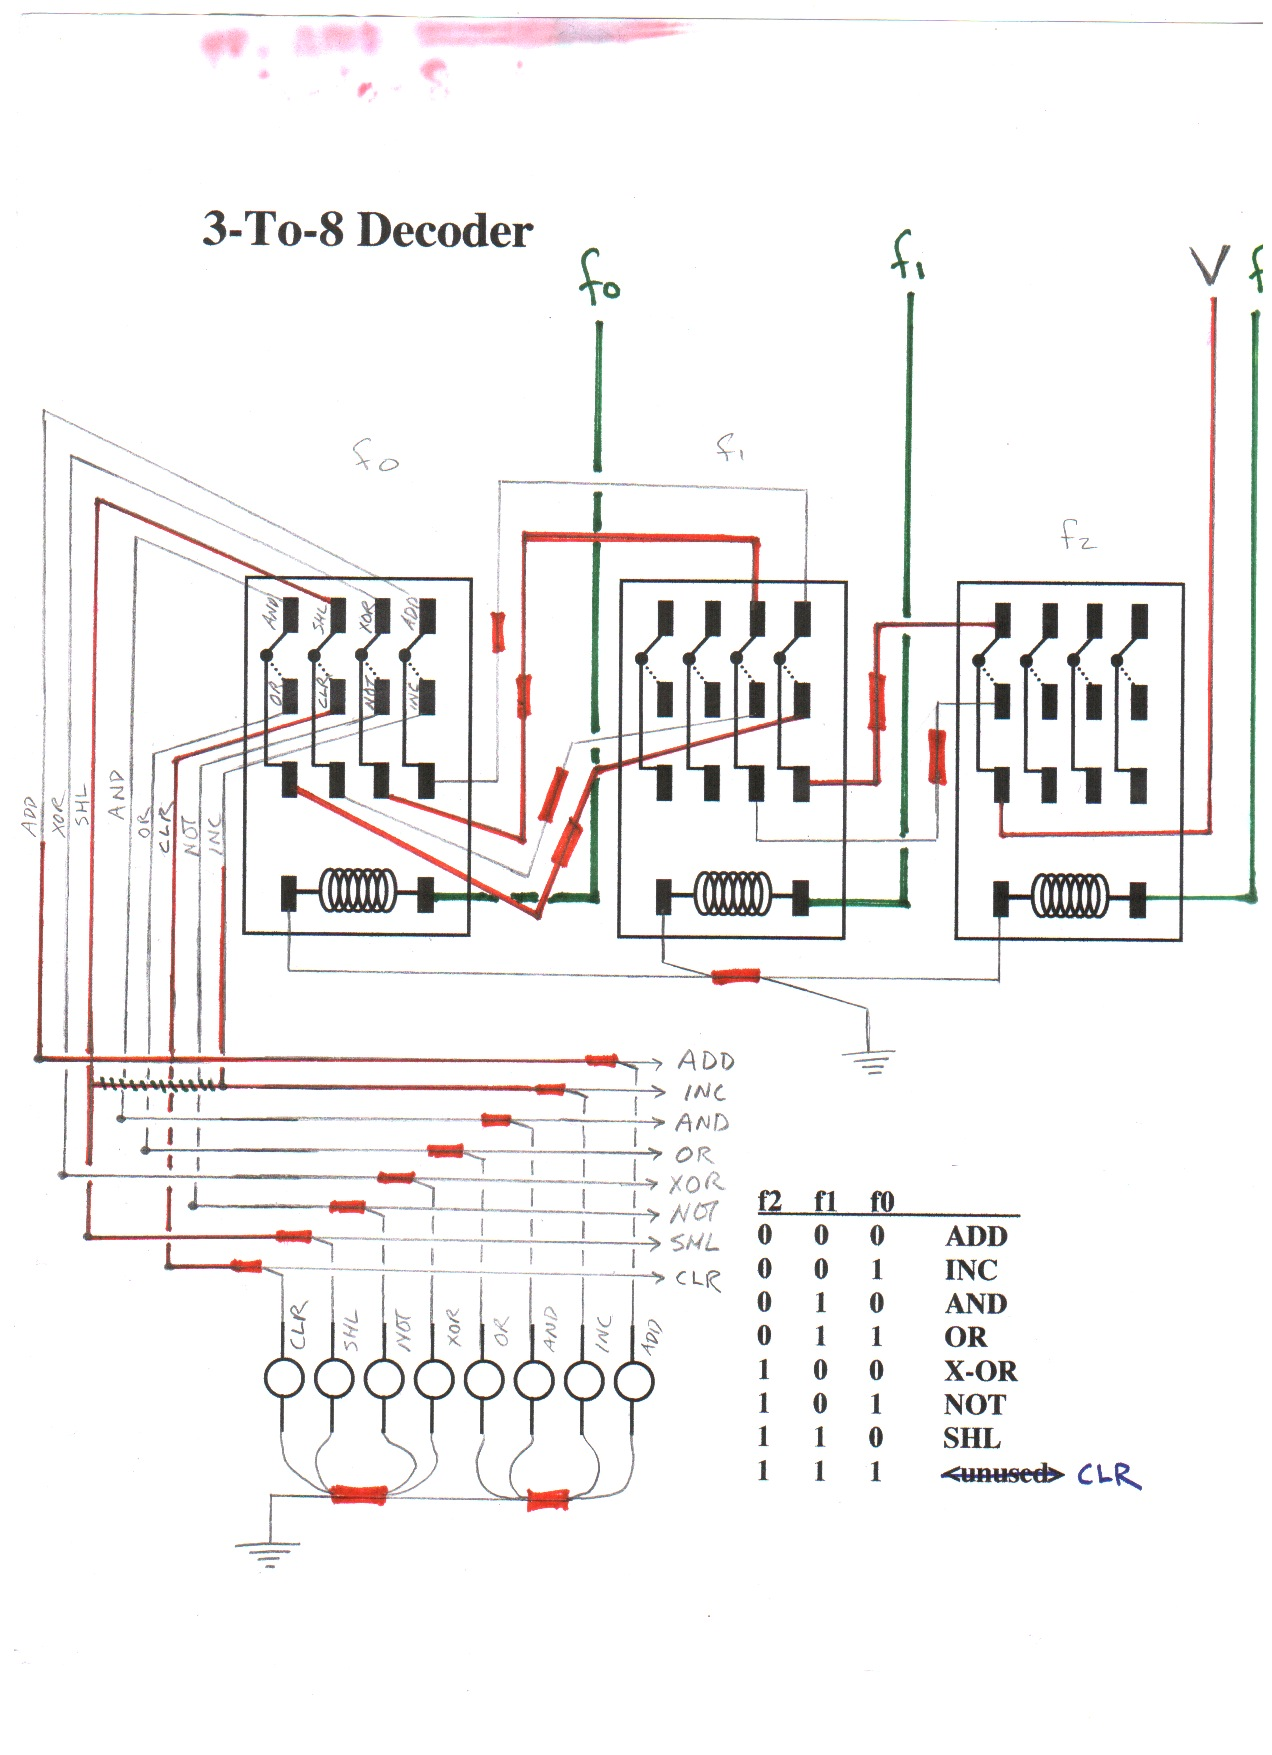 c bus relay wiring diagram metal connector to rj45 cat 6 circuit diagrams